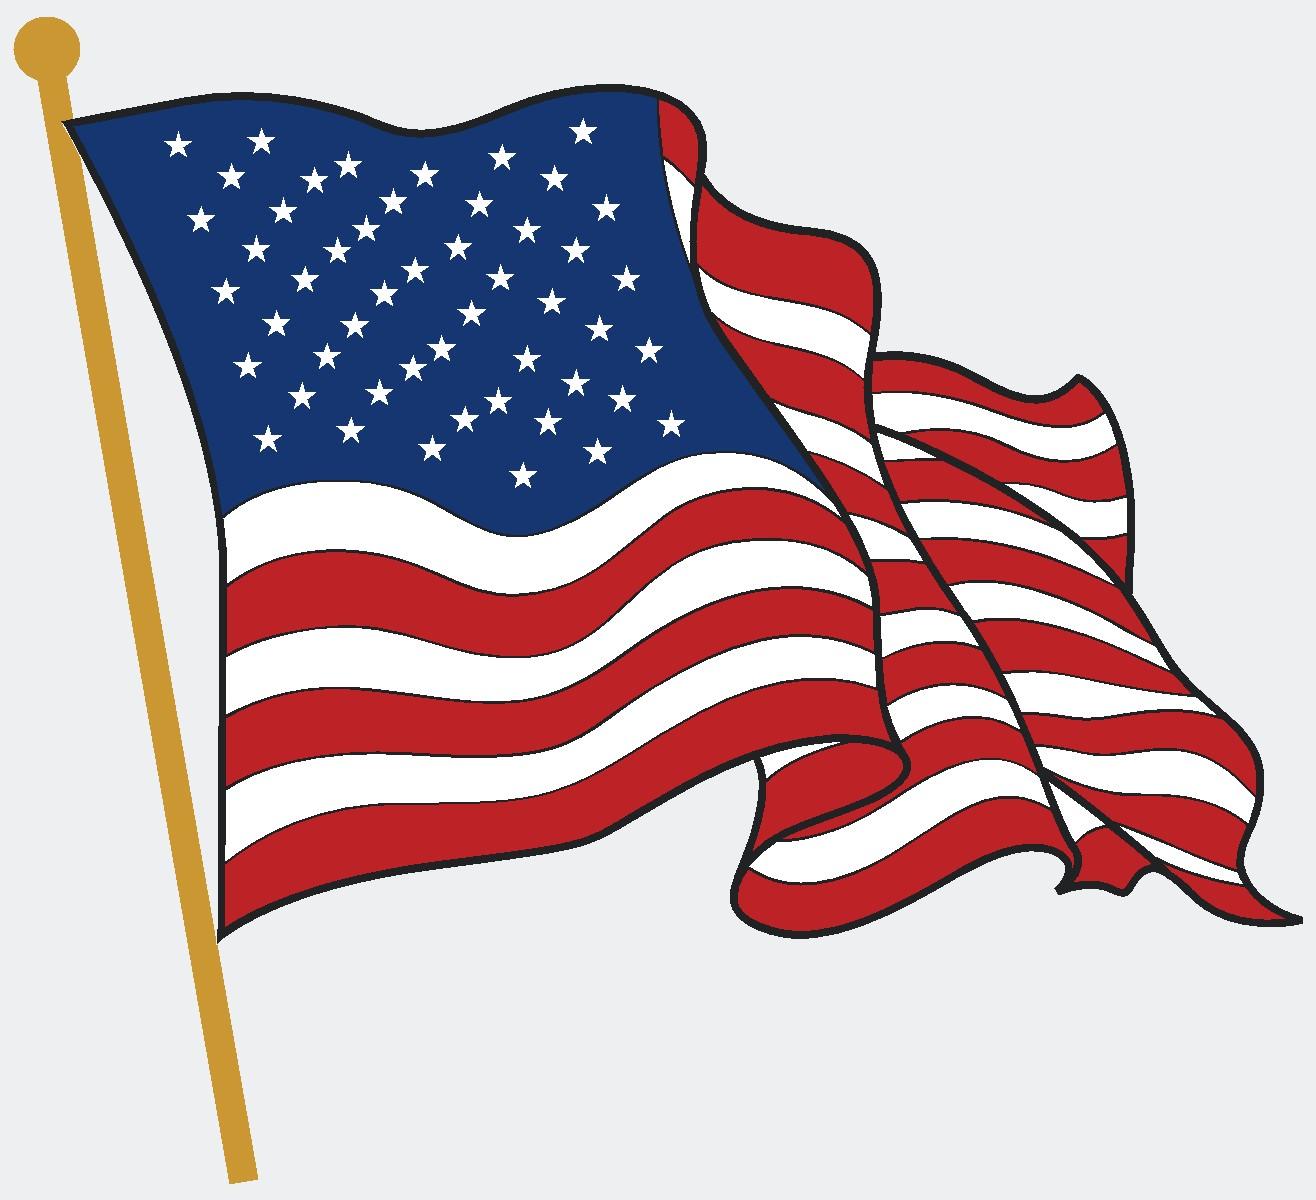 flag clipart school